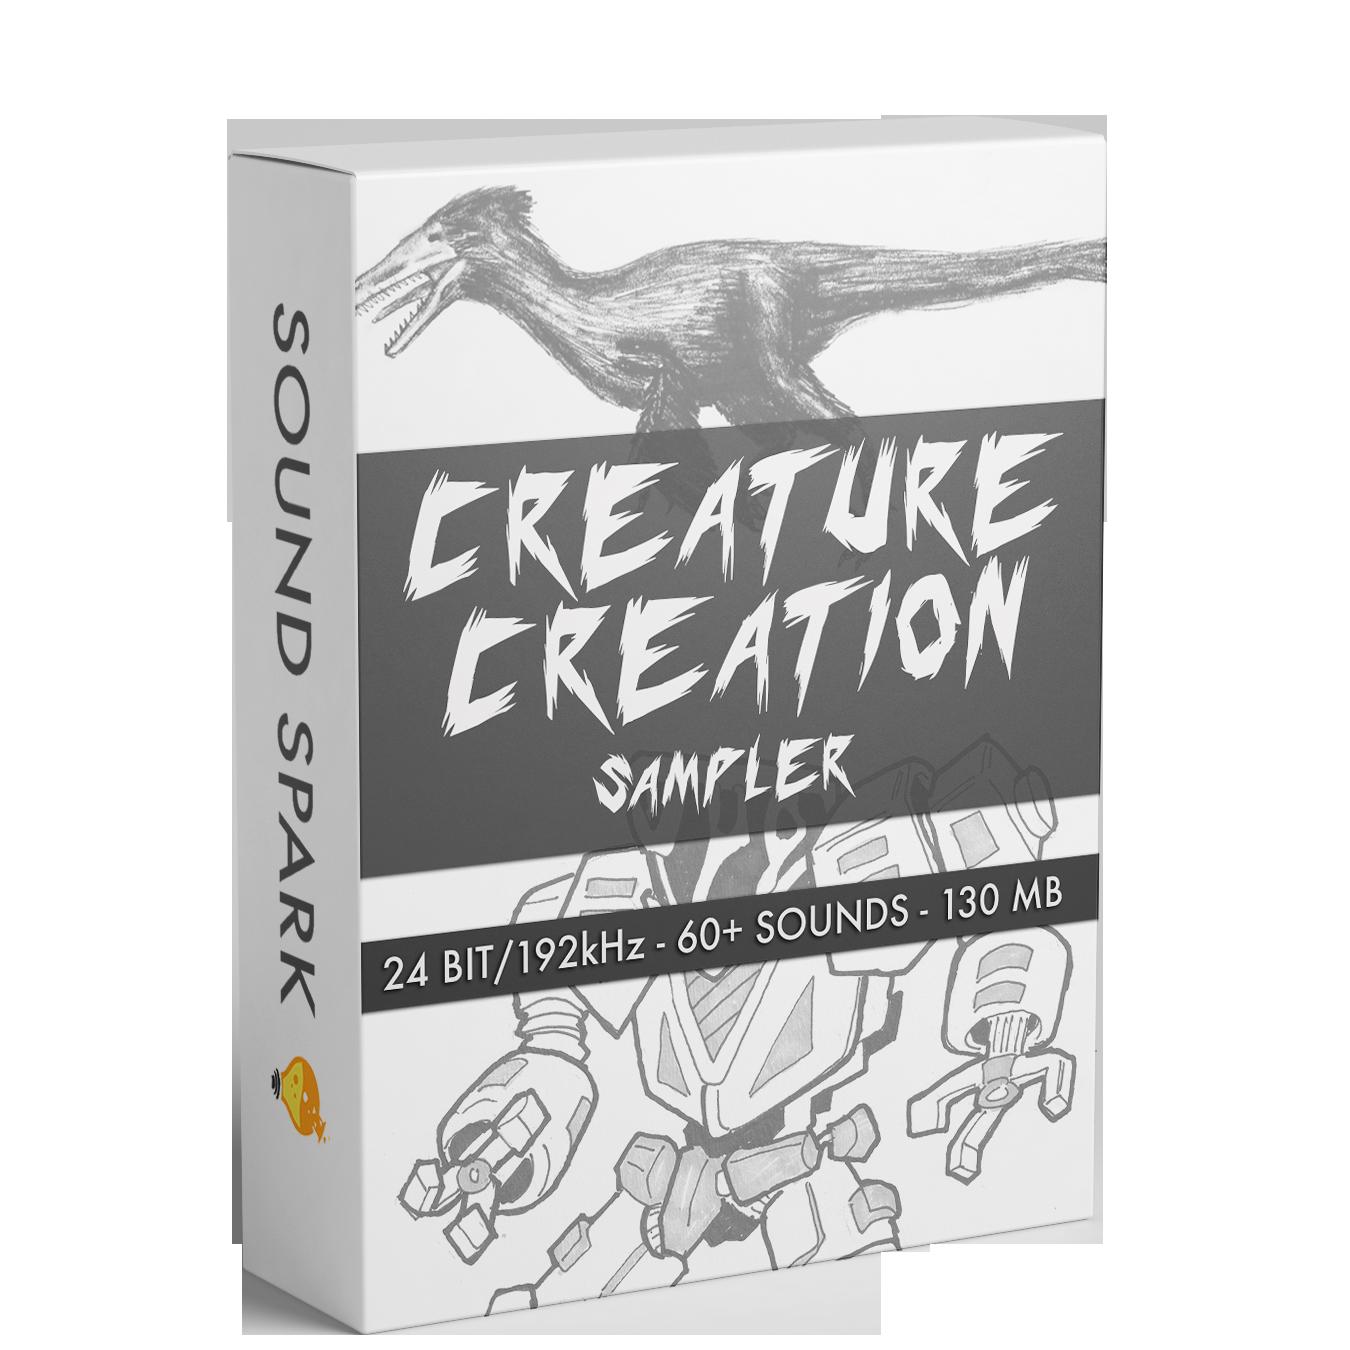 Creature_Creation_Sampler_Box_Mockup_1.png